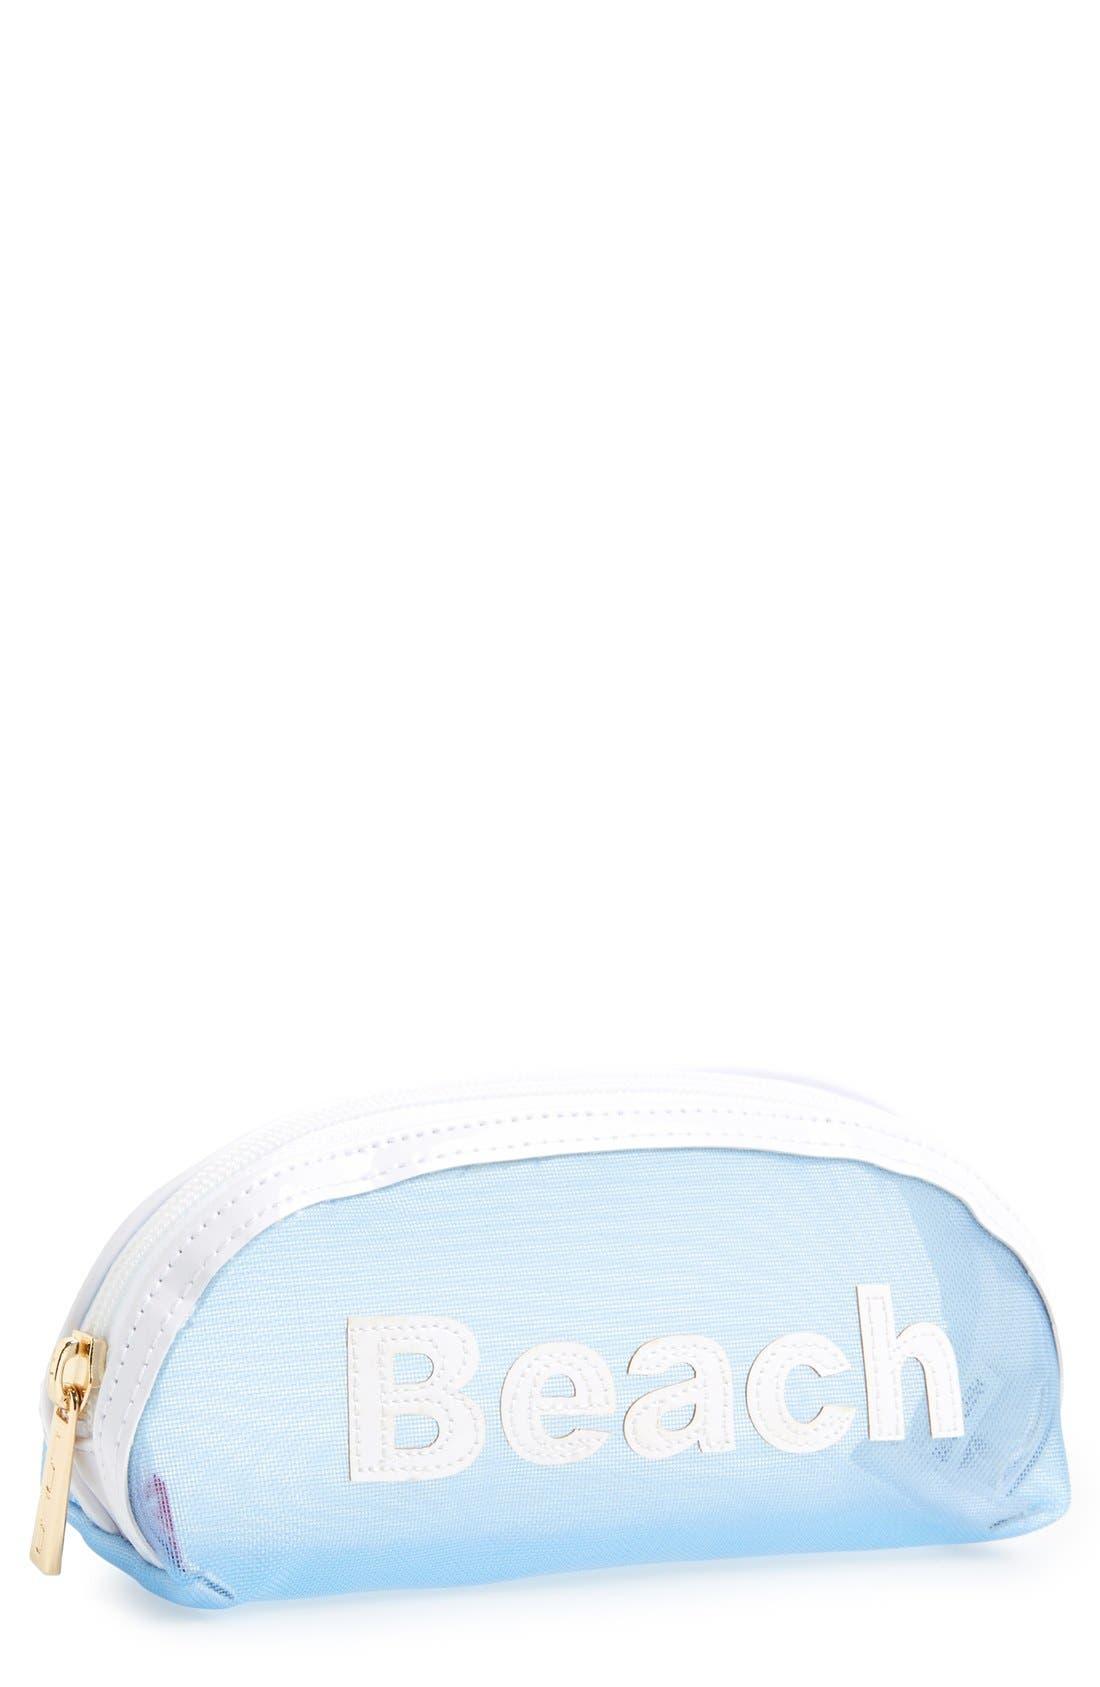 Mesh Sunglasses Pouch,                         Main,                         color, Blue/ White